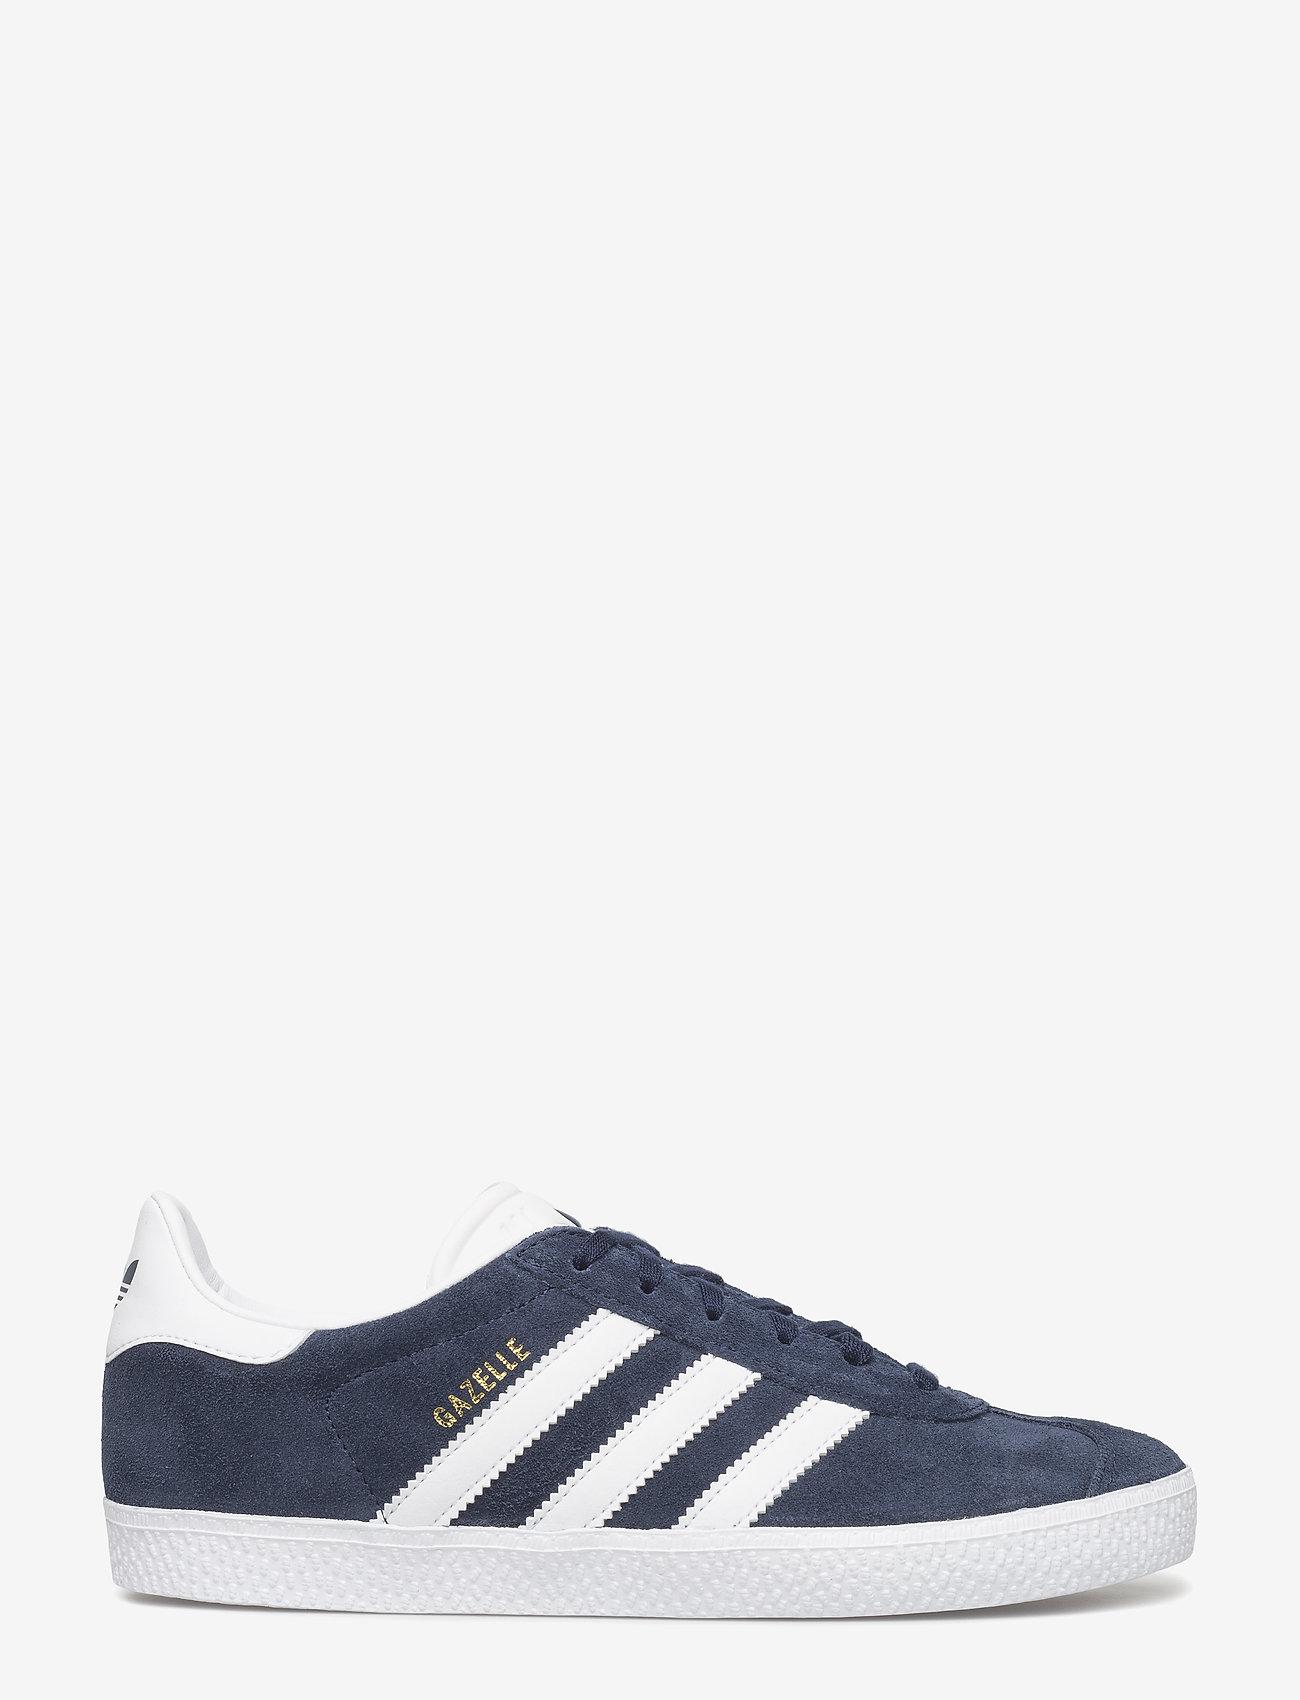 adidas Originals - Gazelle - low tops - conavy/ftwwht/ftwwht - 1